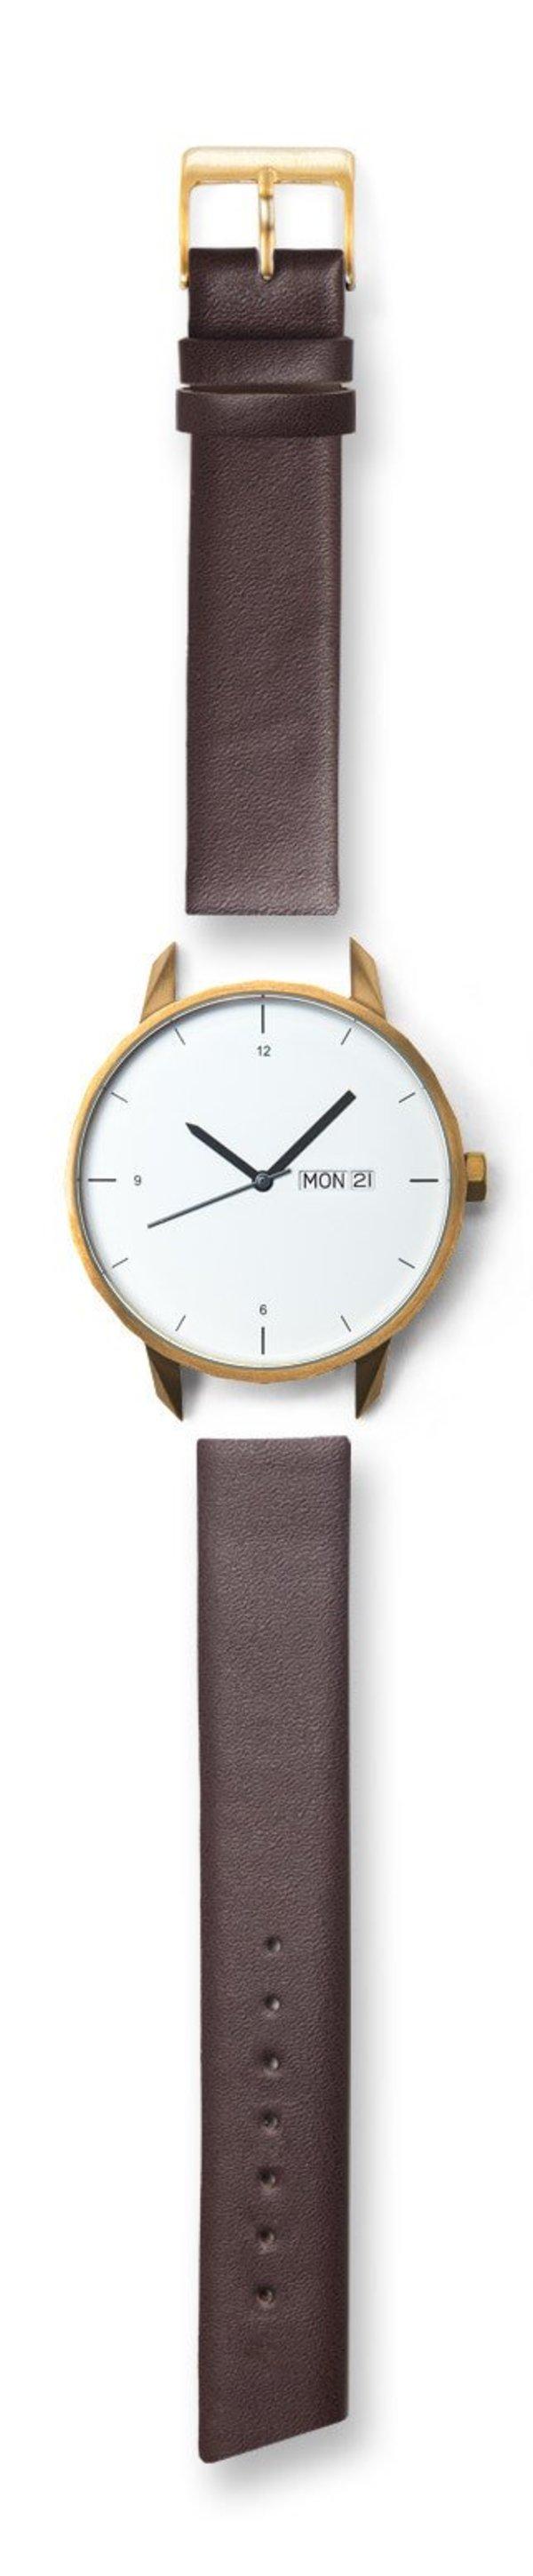 Unisex Tinker Watches 42mm Gold Watch Brown Strap